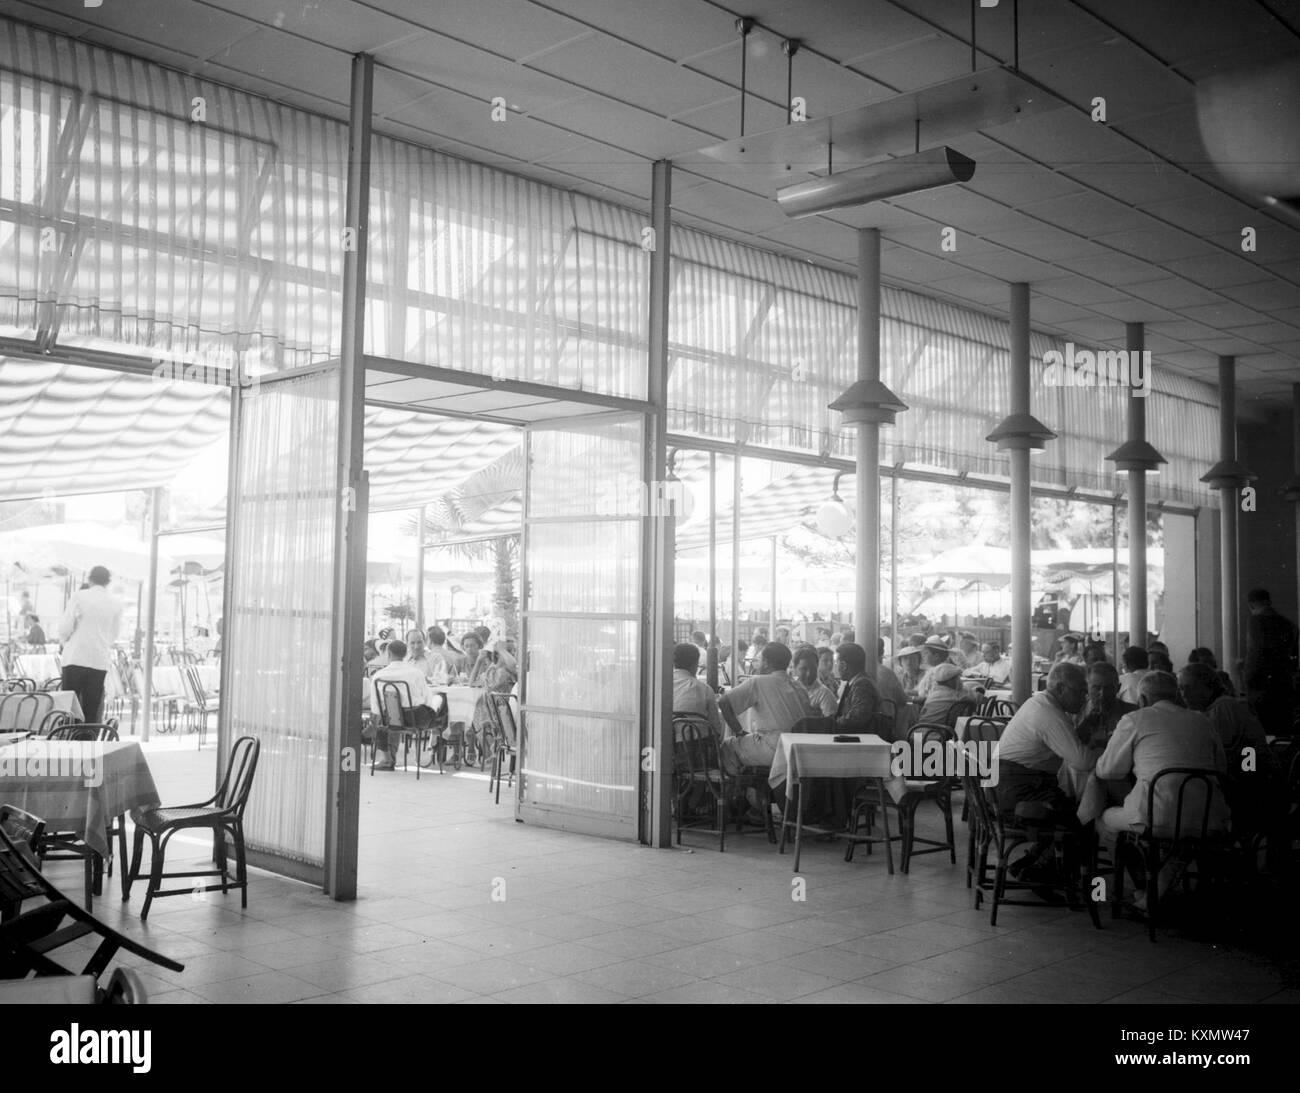 A COFFEE SHOP IN TEL AVIV. בית קפה בתל אביב.D403-140 Stock Photo